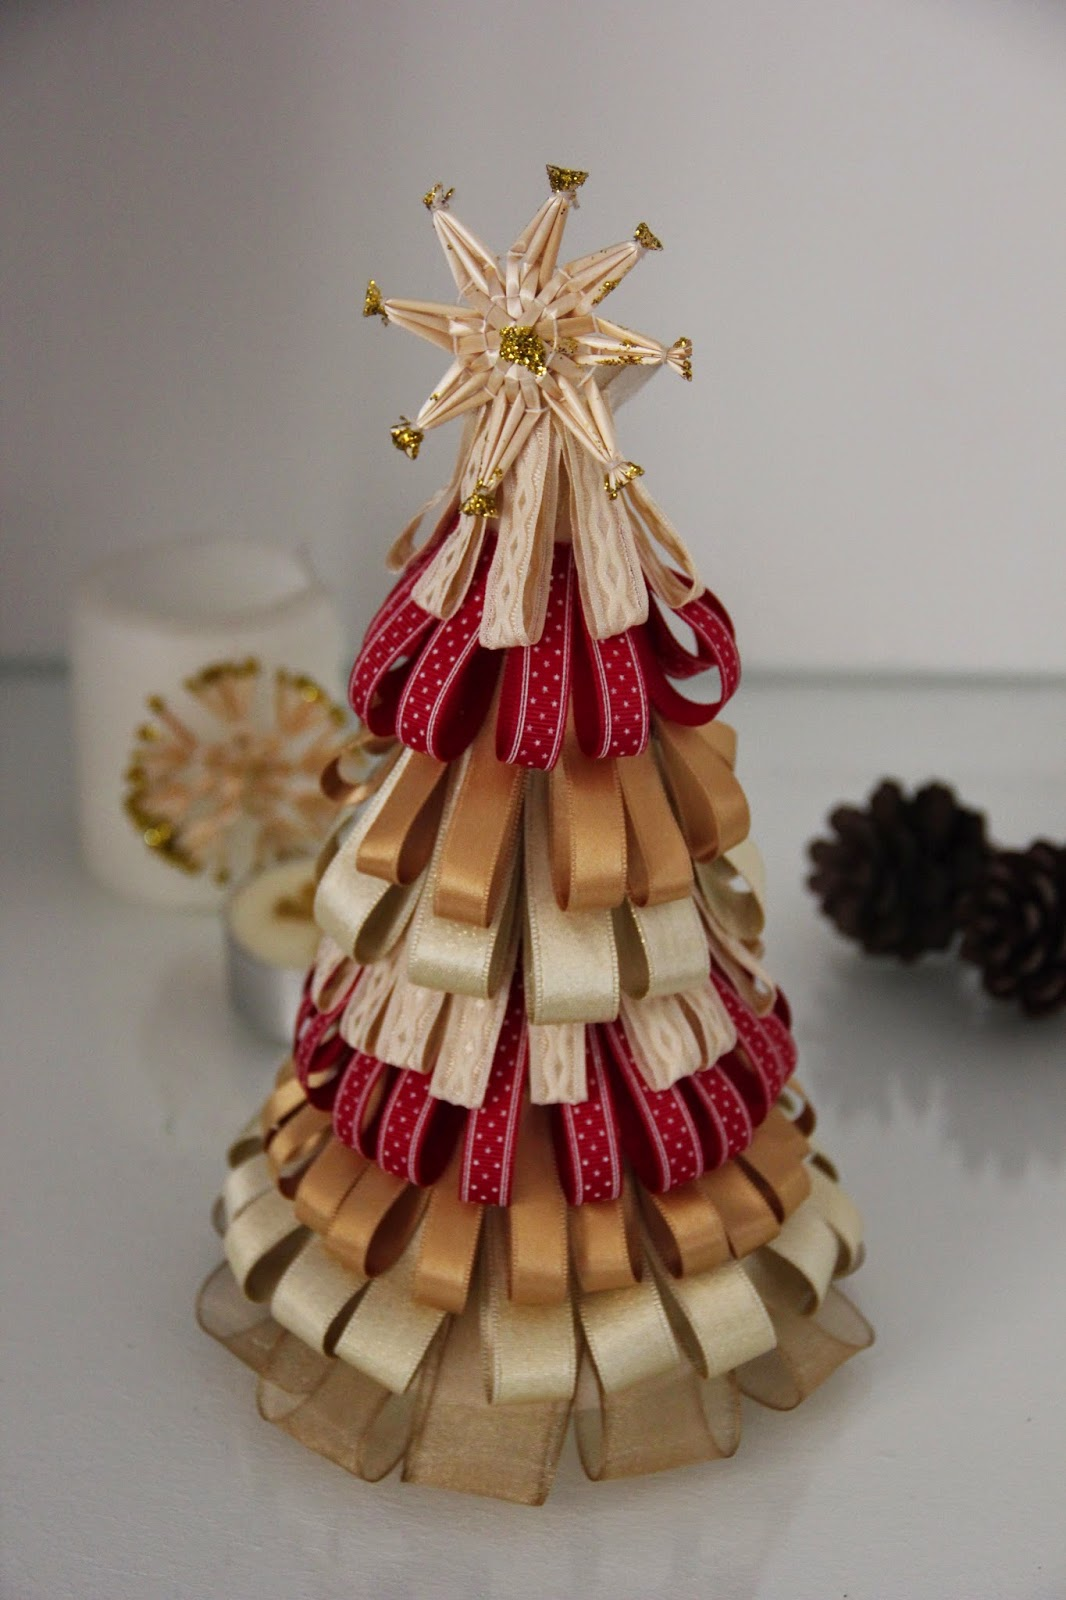 Pegamento para porexpan aprender manualidades es - Cintas navidad para arbol ...